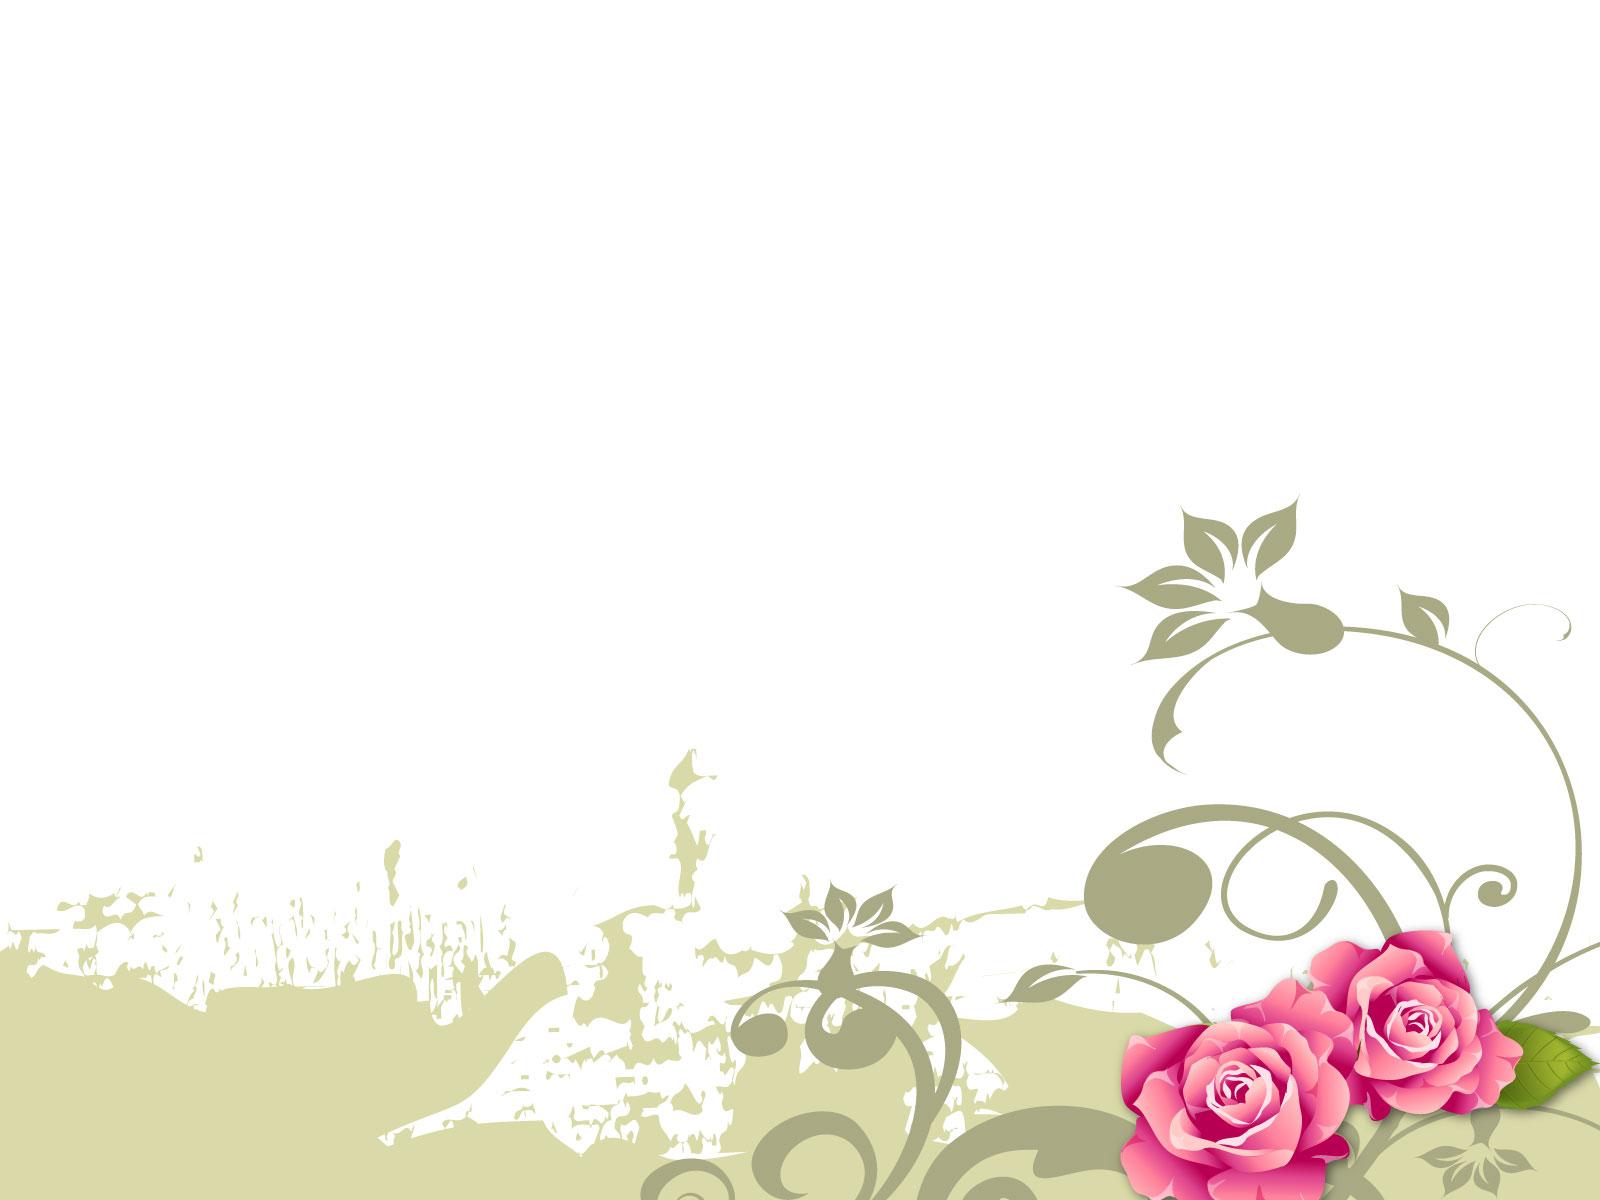 wp contentuploads201406flower background designs free downloadjpg 1600x1200